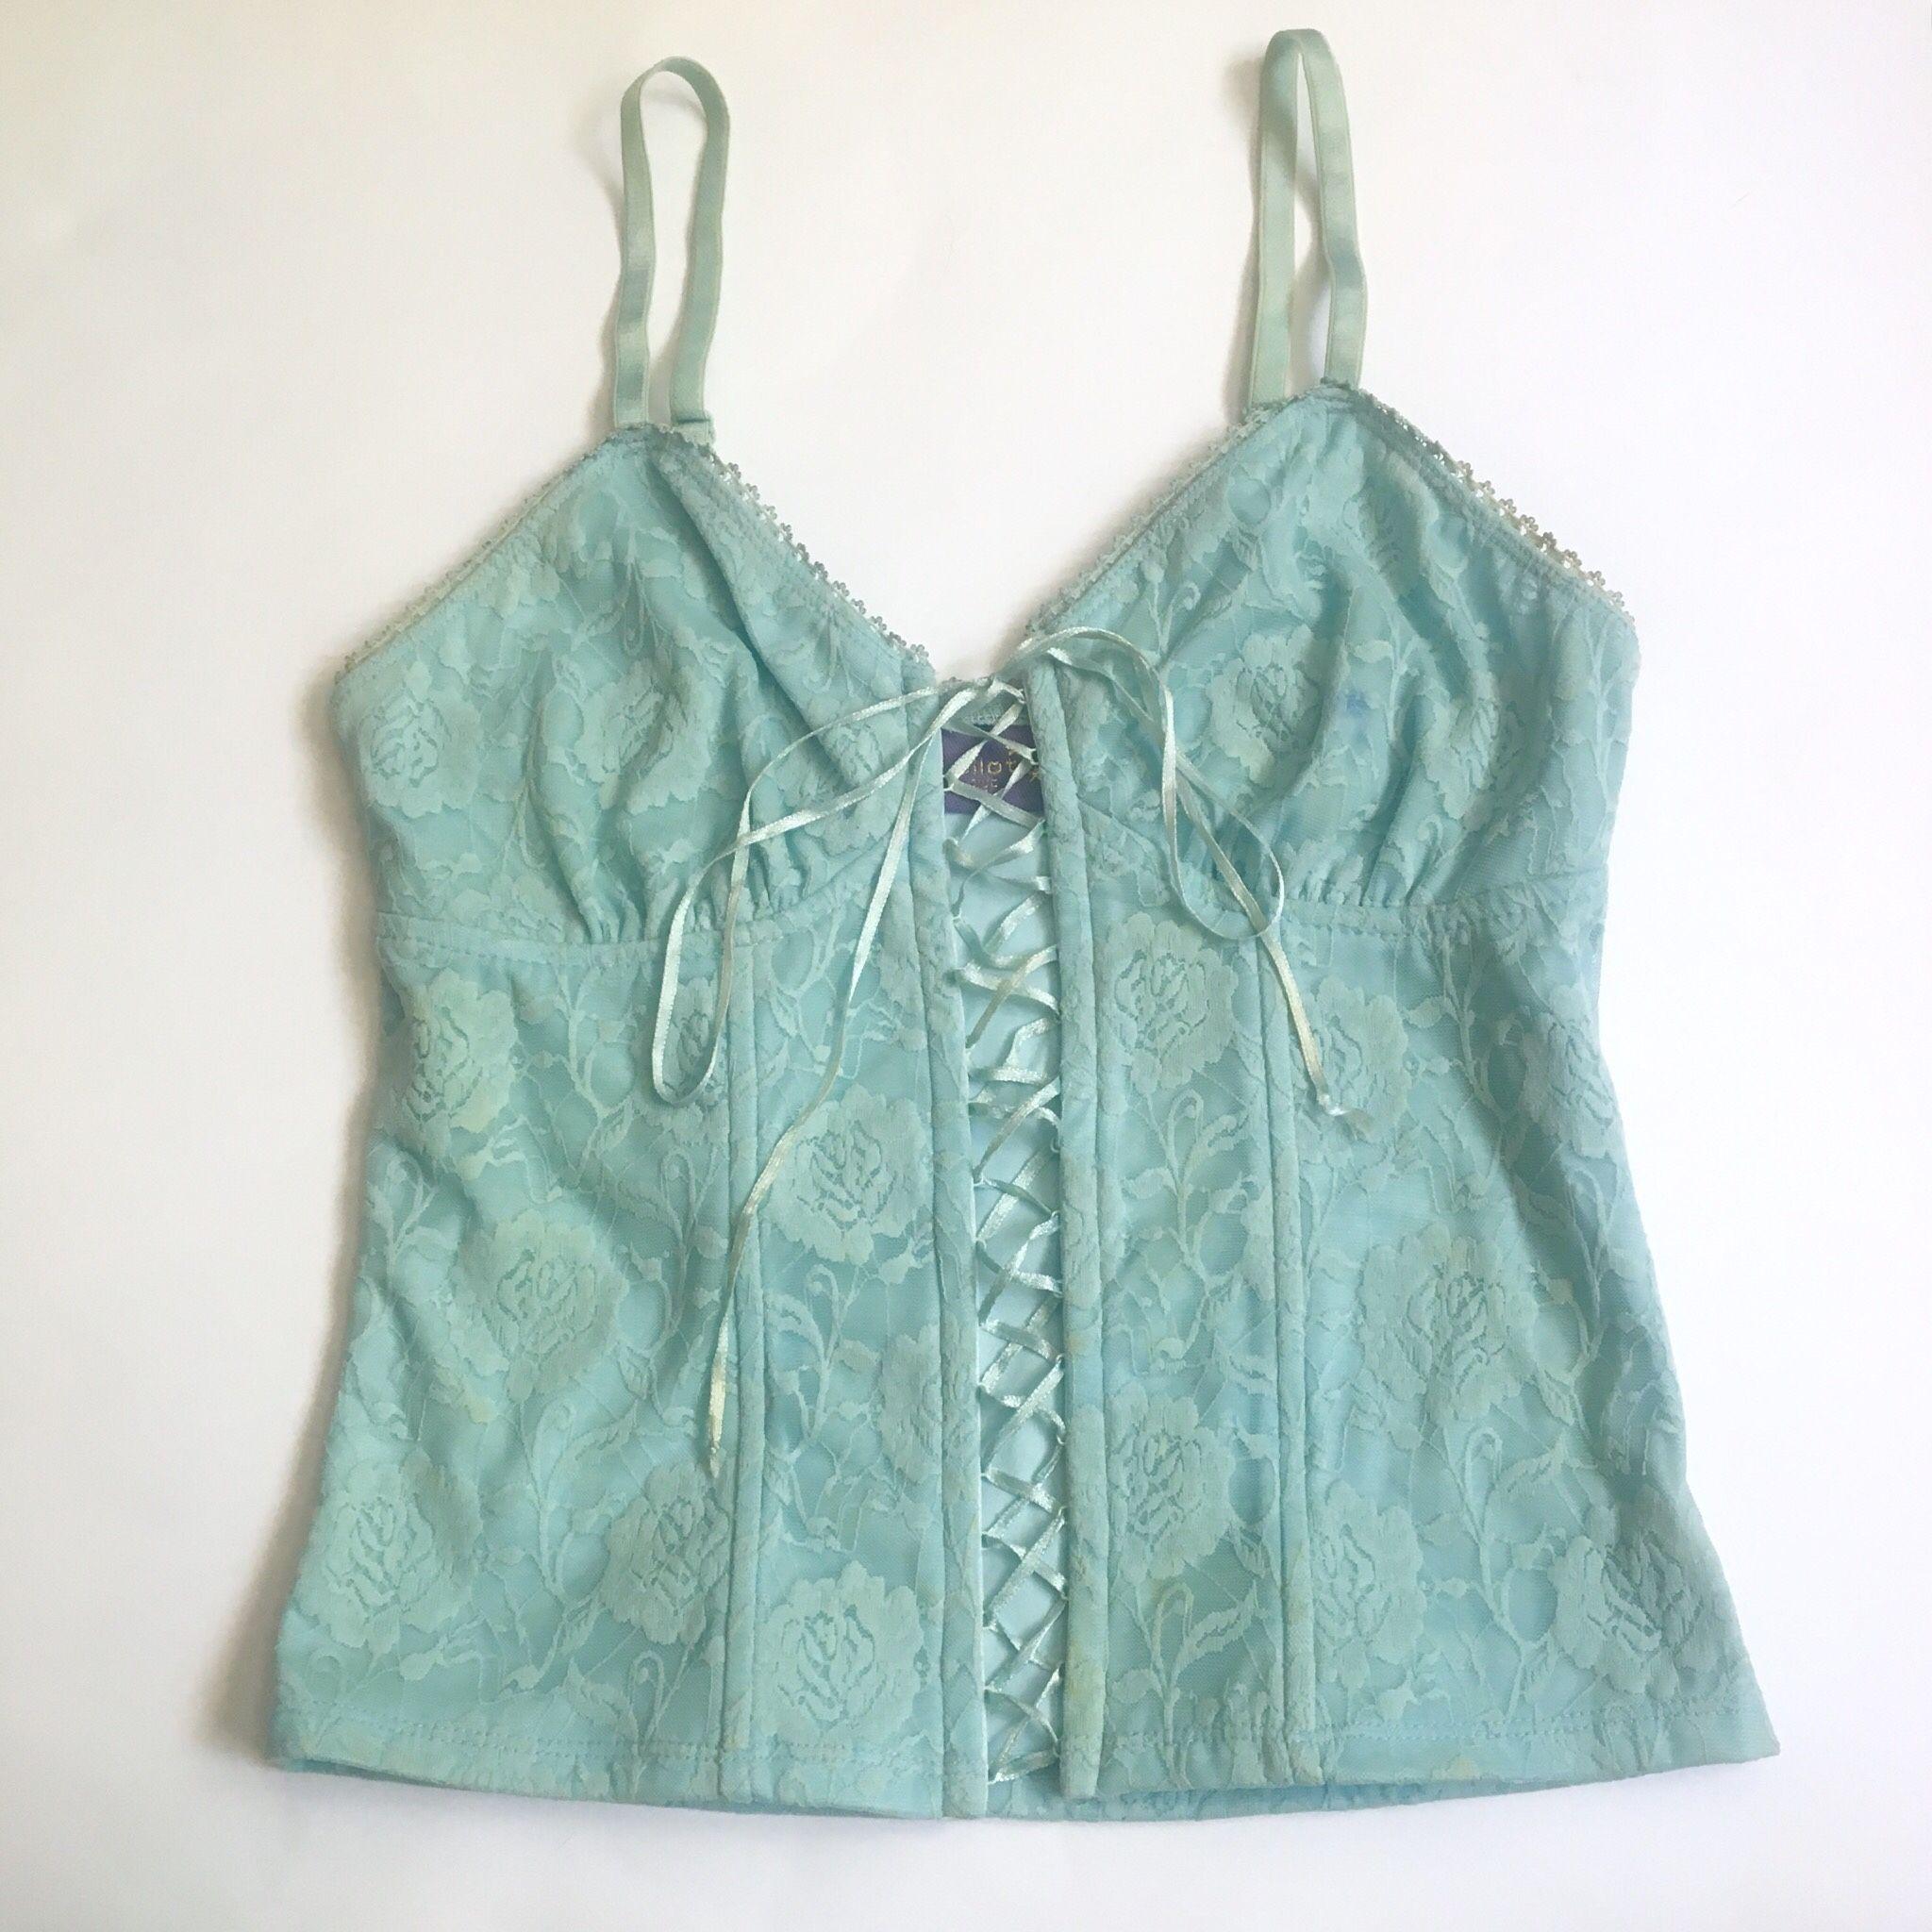 Amazing Vintage 90s Y2k Pilot Baby Blue Mint Lace Depop In 2020 Fashion Aesthetic Clothes Clothes